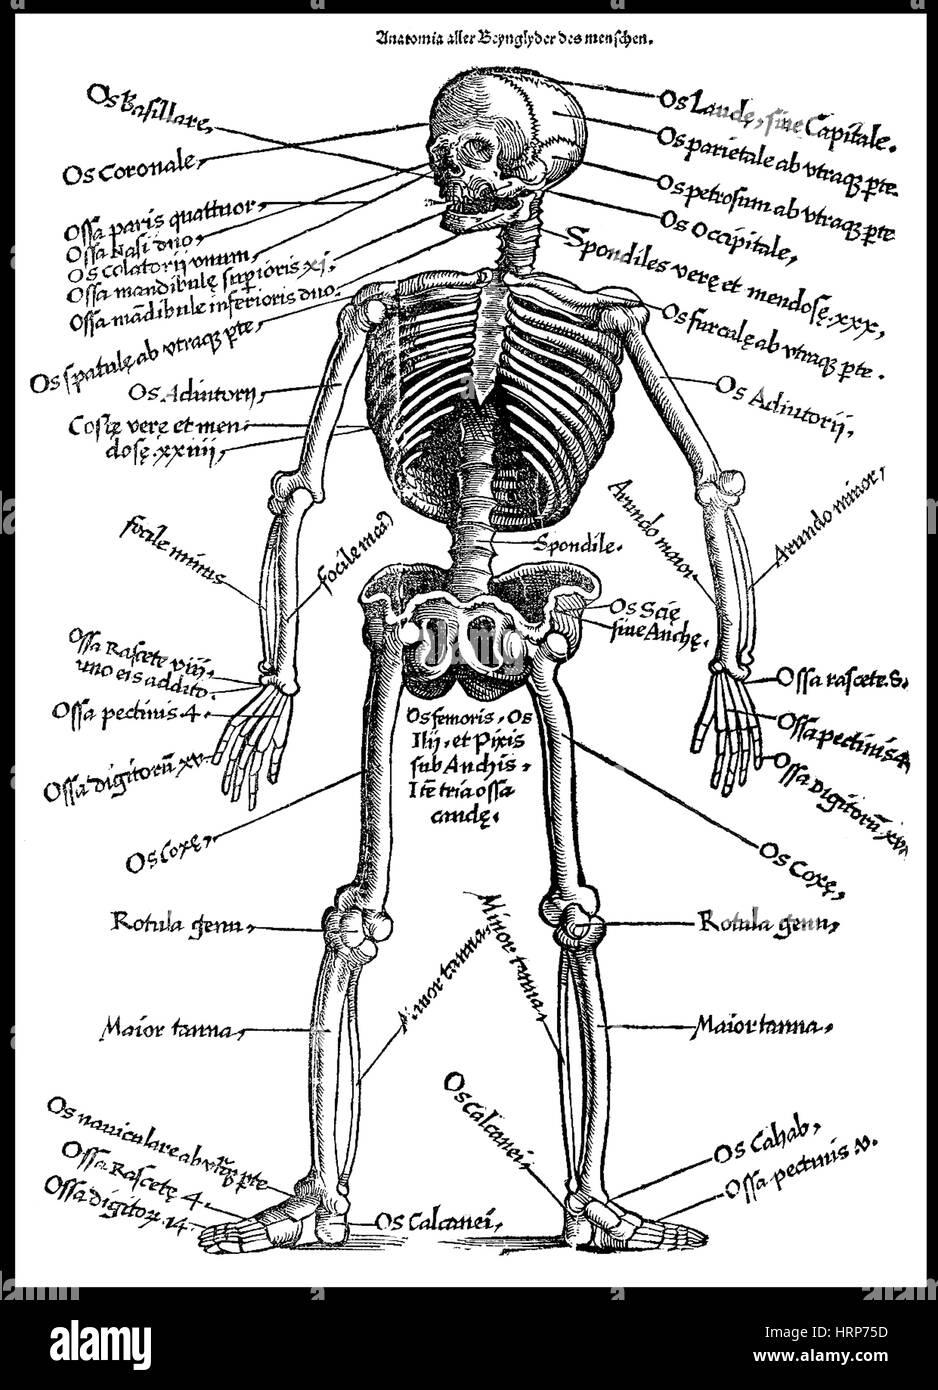 Human Skeleton, 'Feldbuch der Wundartzney', 1528 - Stock Image